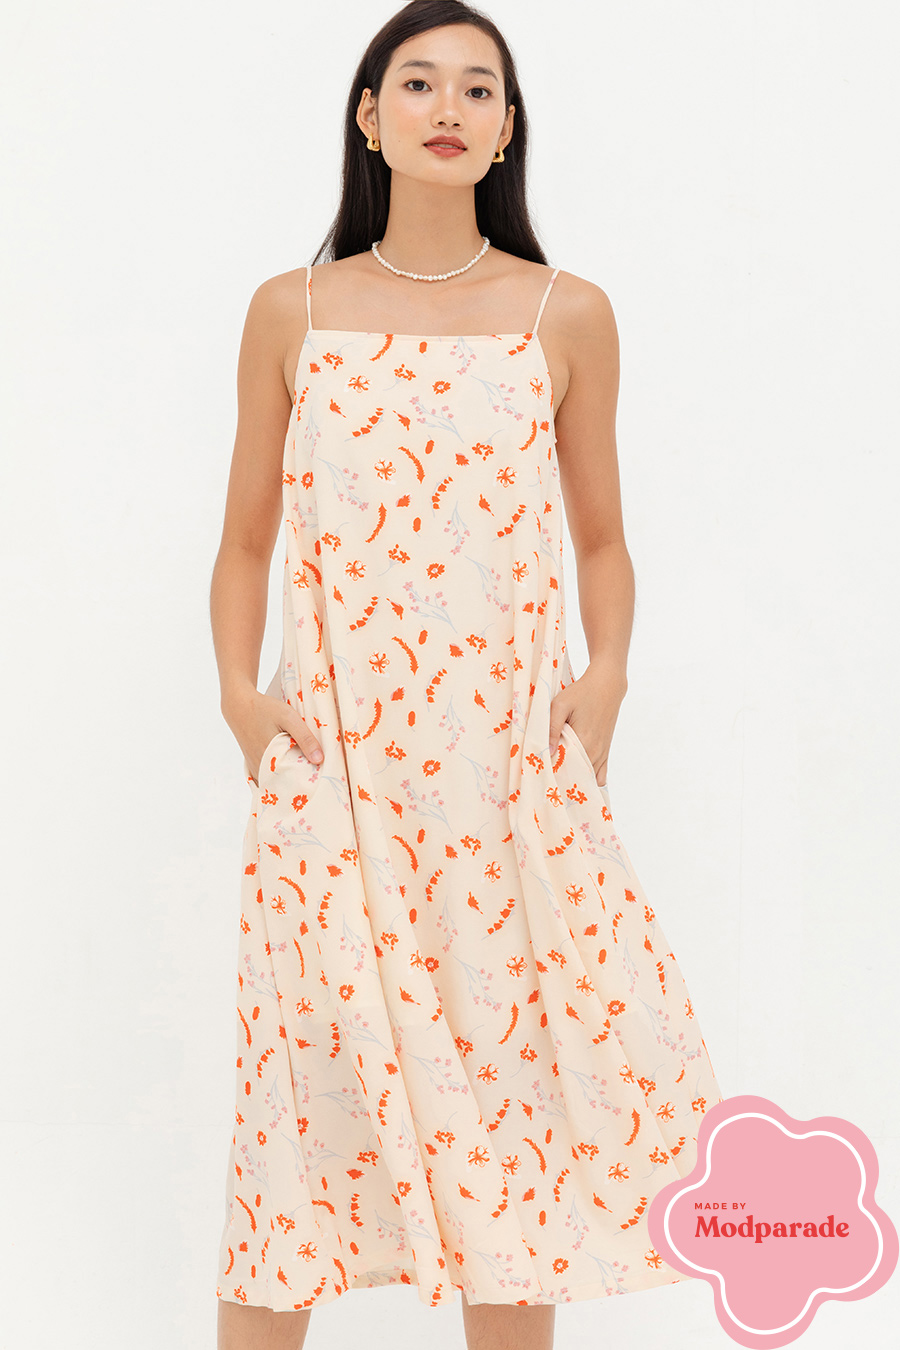 SENNA DRESS - NARCISSA [WAREHAUS EXCLUSIVE]